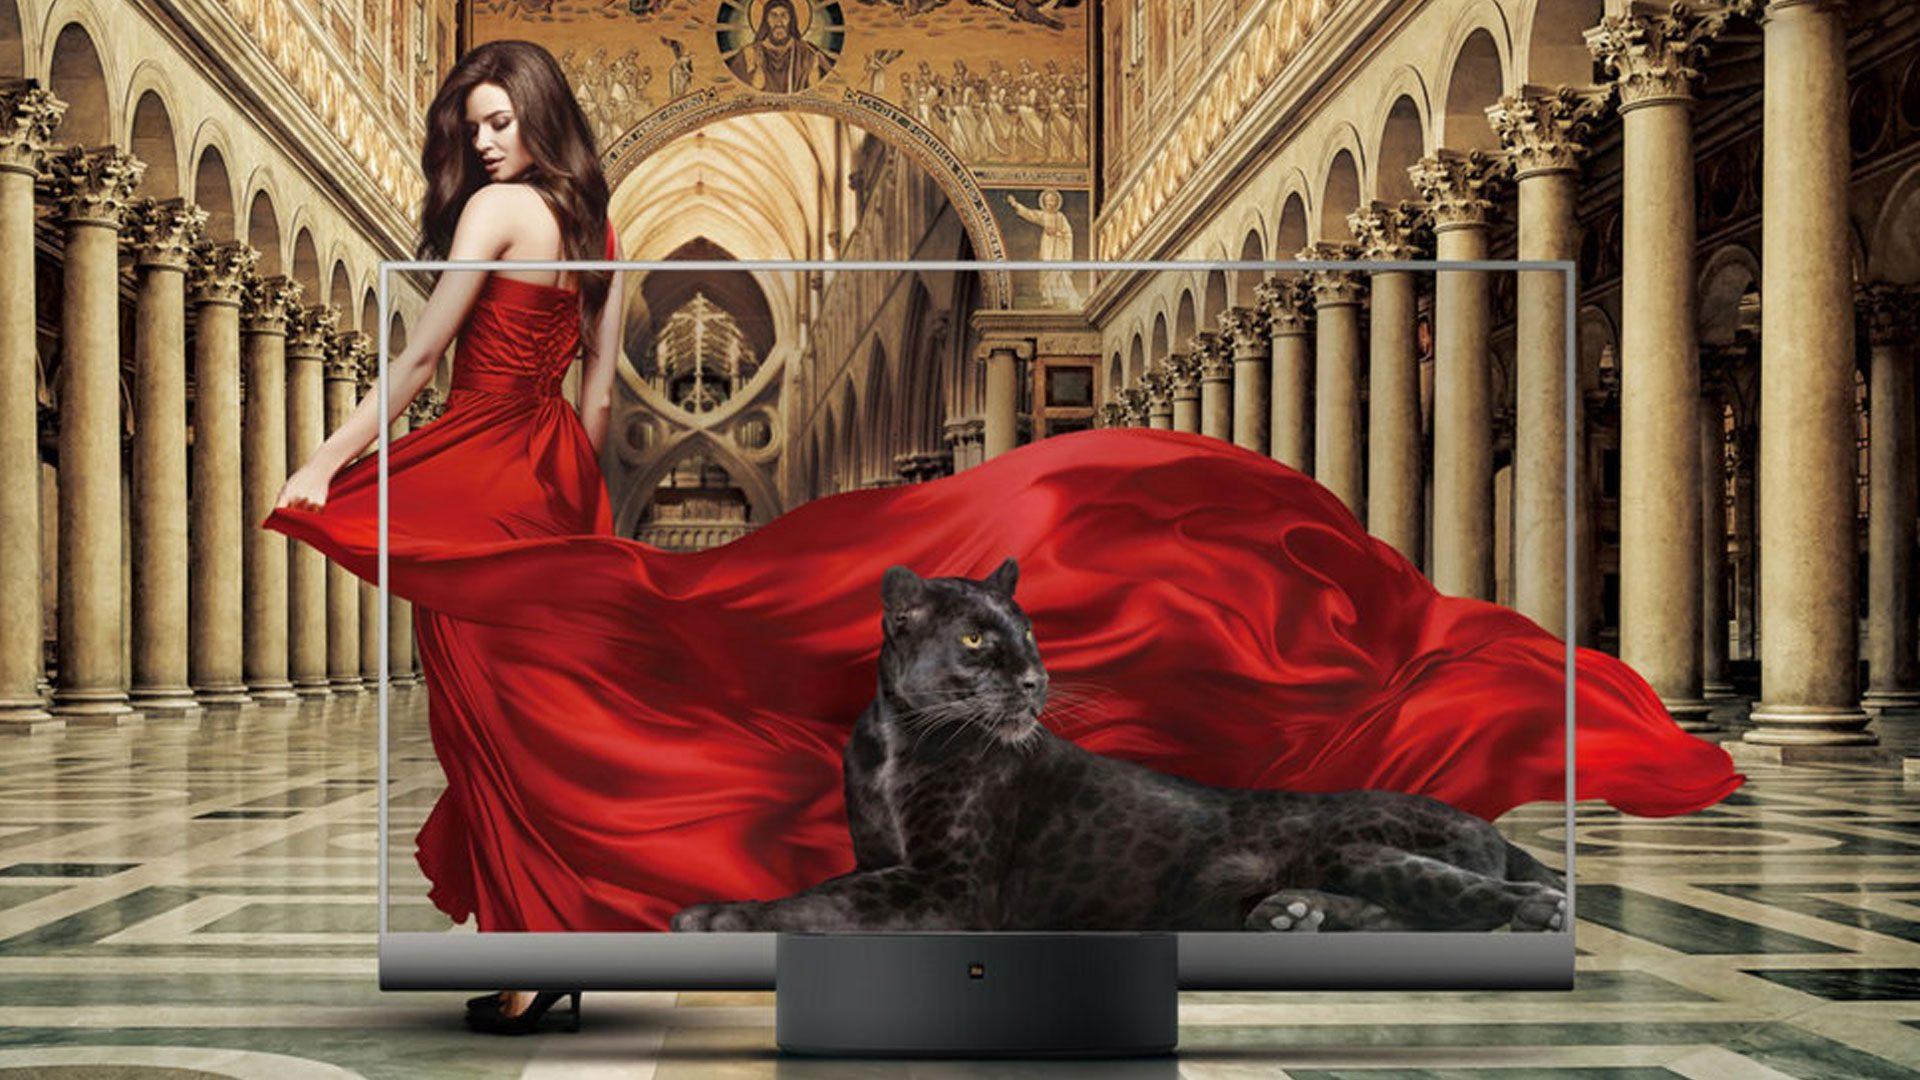 Xiaomi Mi TV Lux is een transparante oled-televisie